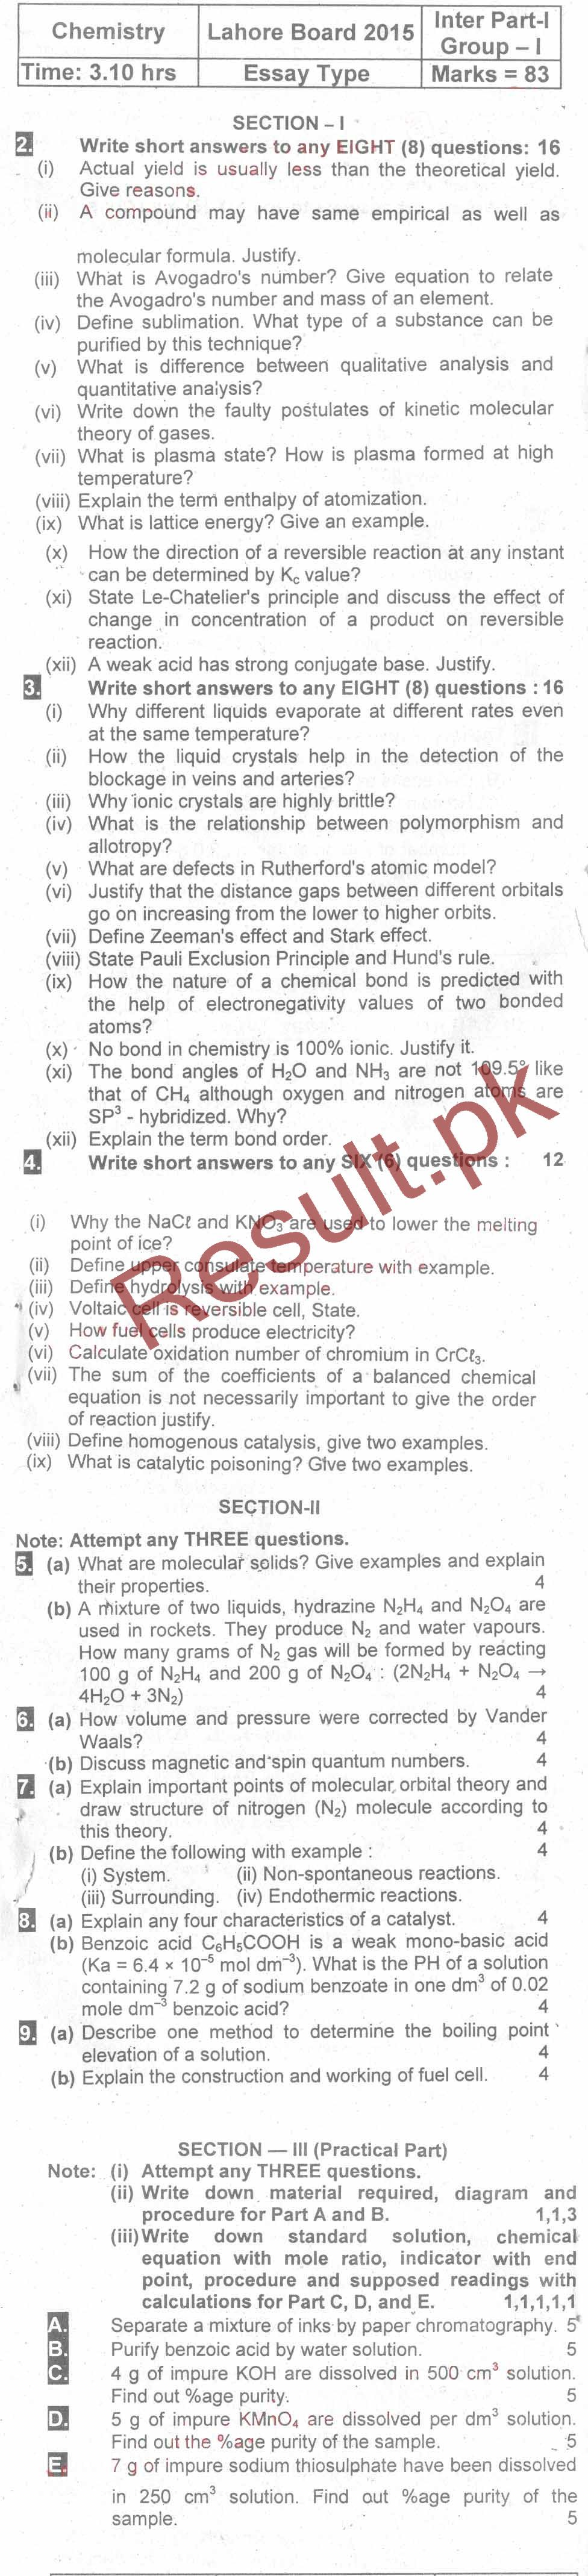 BISE Faisalabad Board Past Papers 2019 Inter Part 1 2, FA, HSSC, FSC